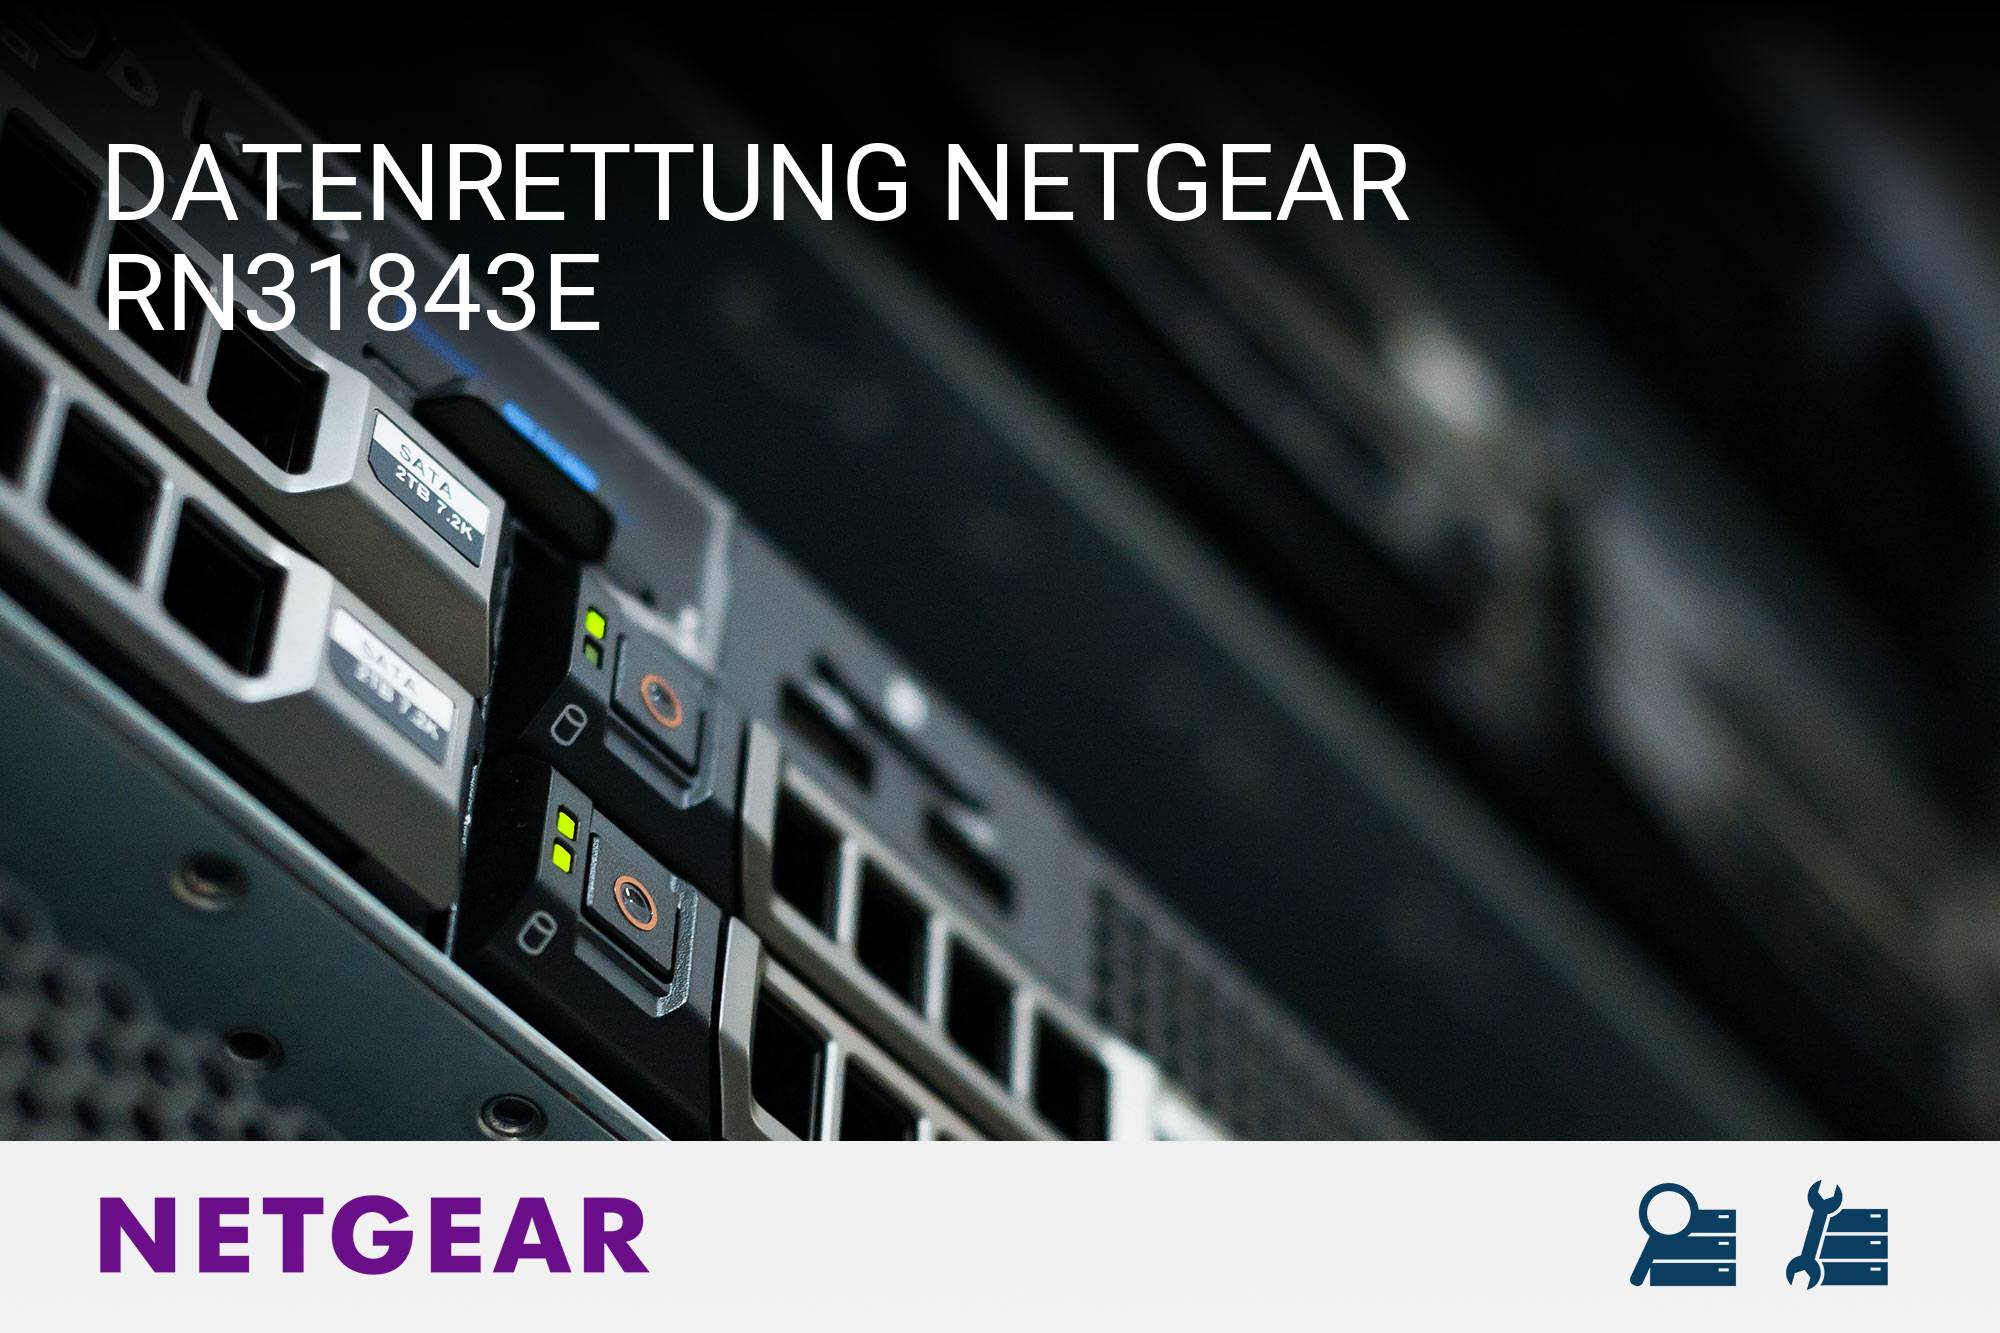 Netgear RN31843E